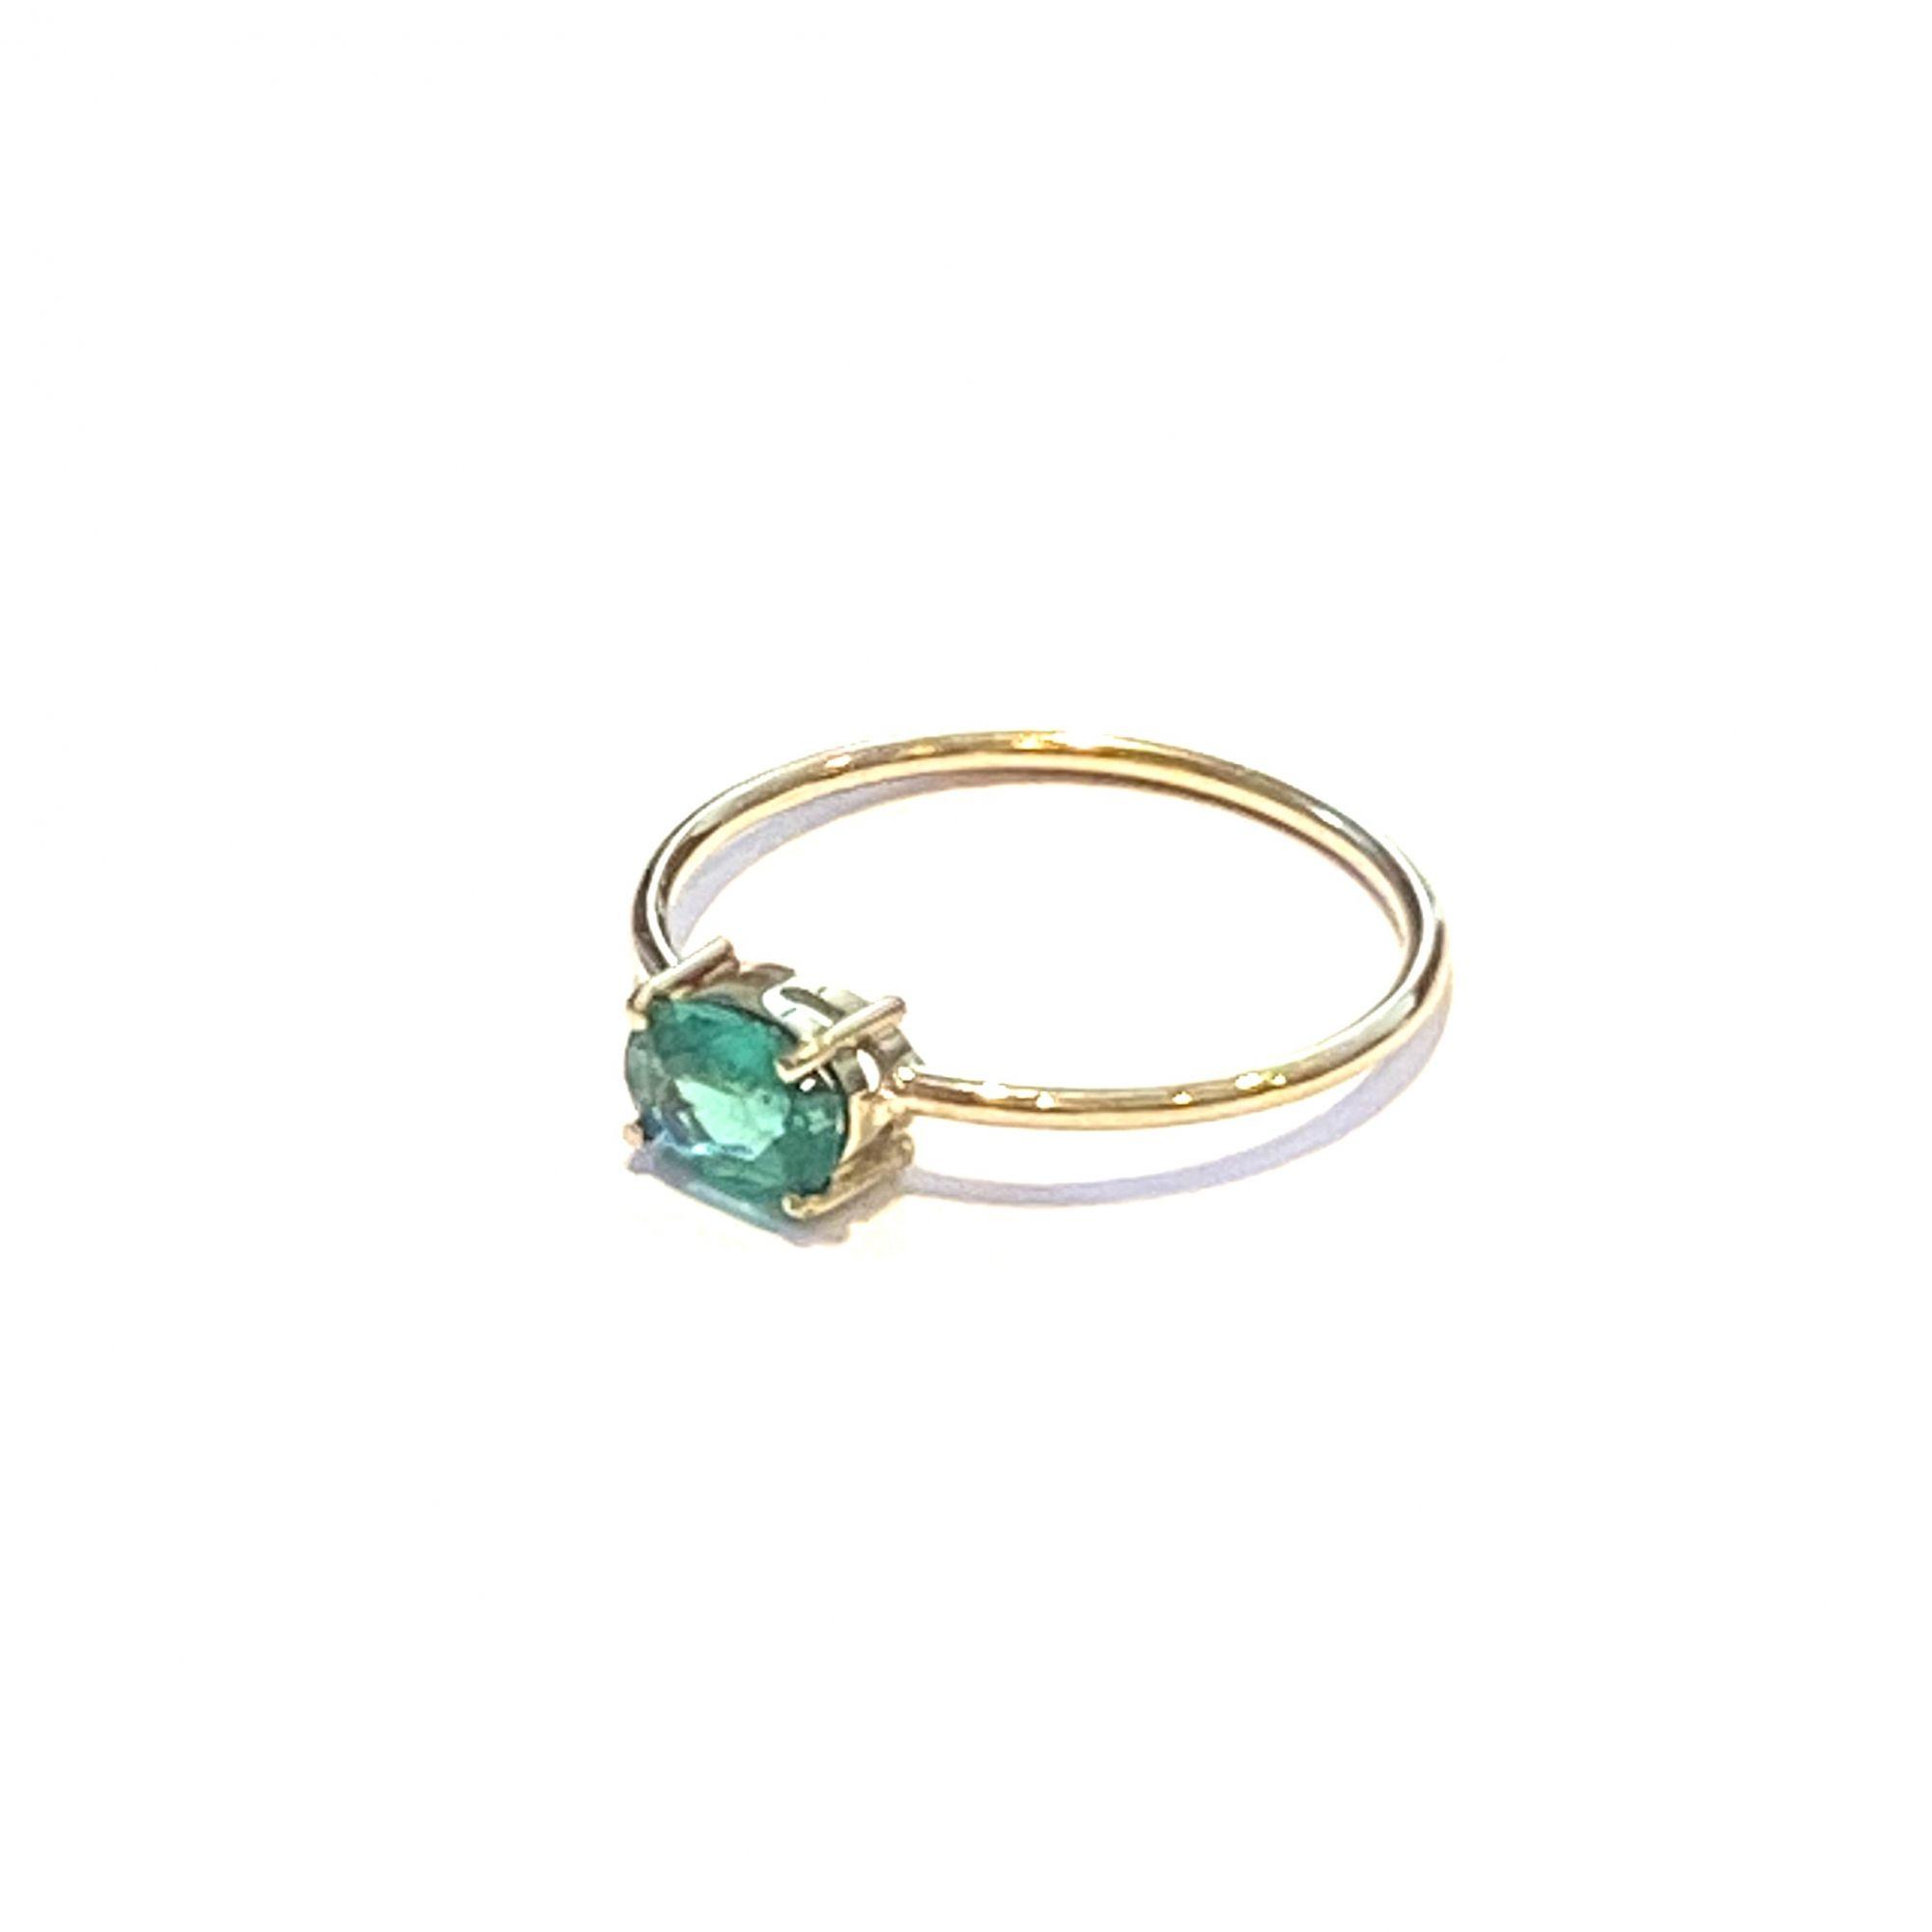 Anel Ouro 18K Esmeralda Oval Geometrico Natural Feminino Pedra Verde 0.6X.04cm E02ct05K240